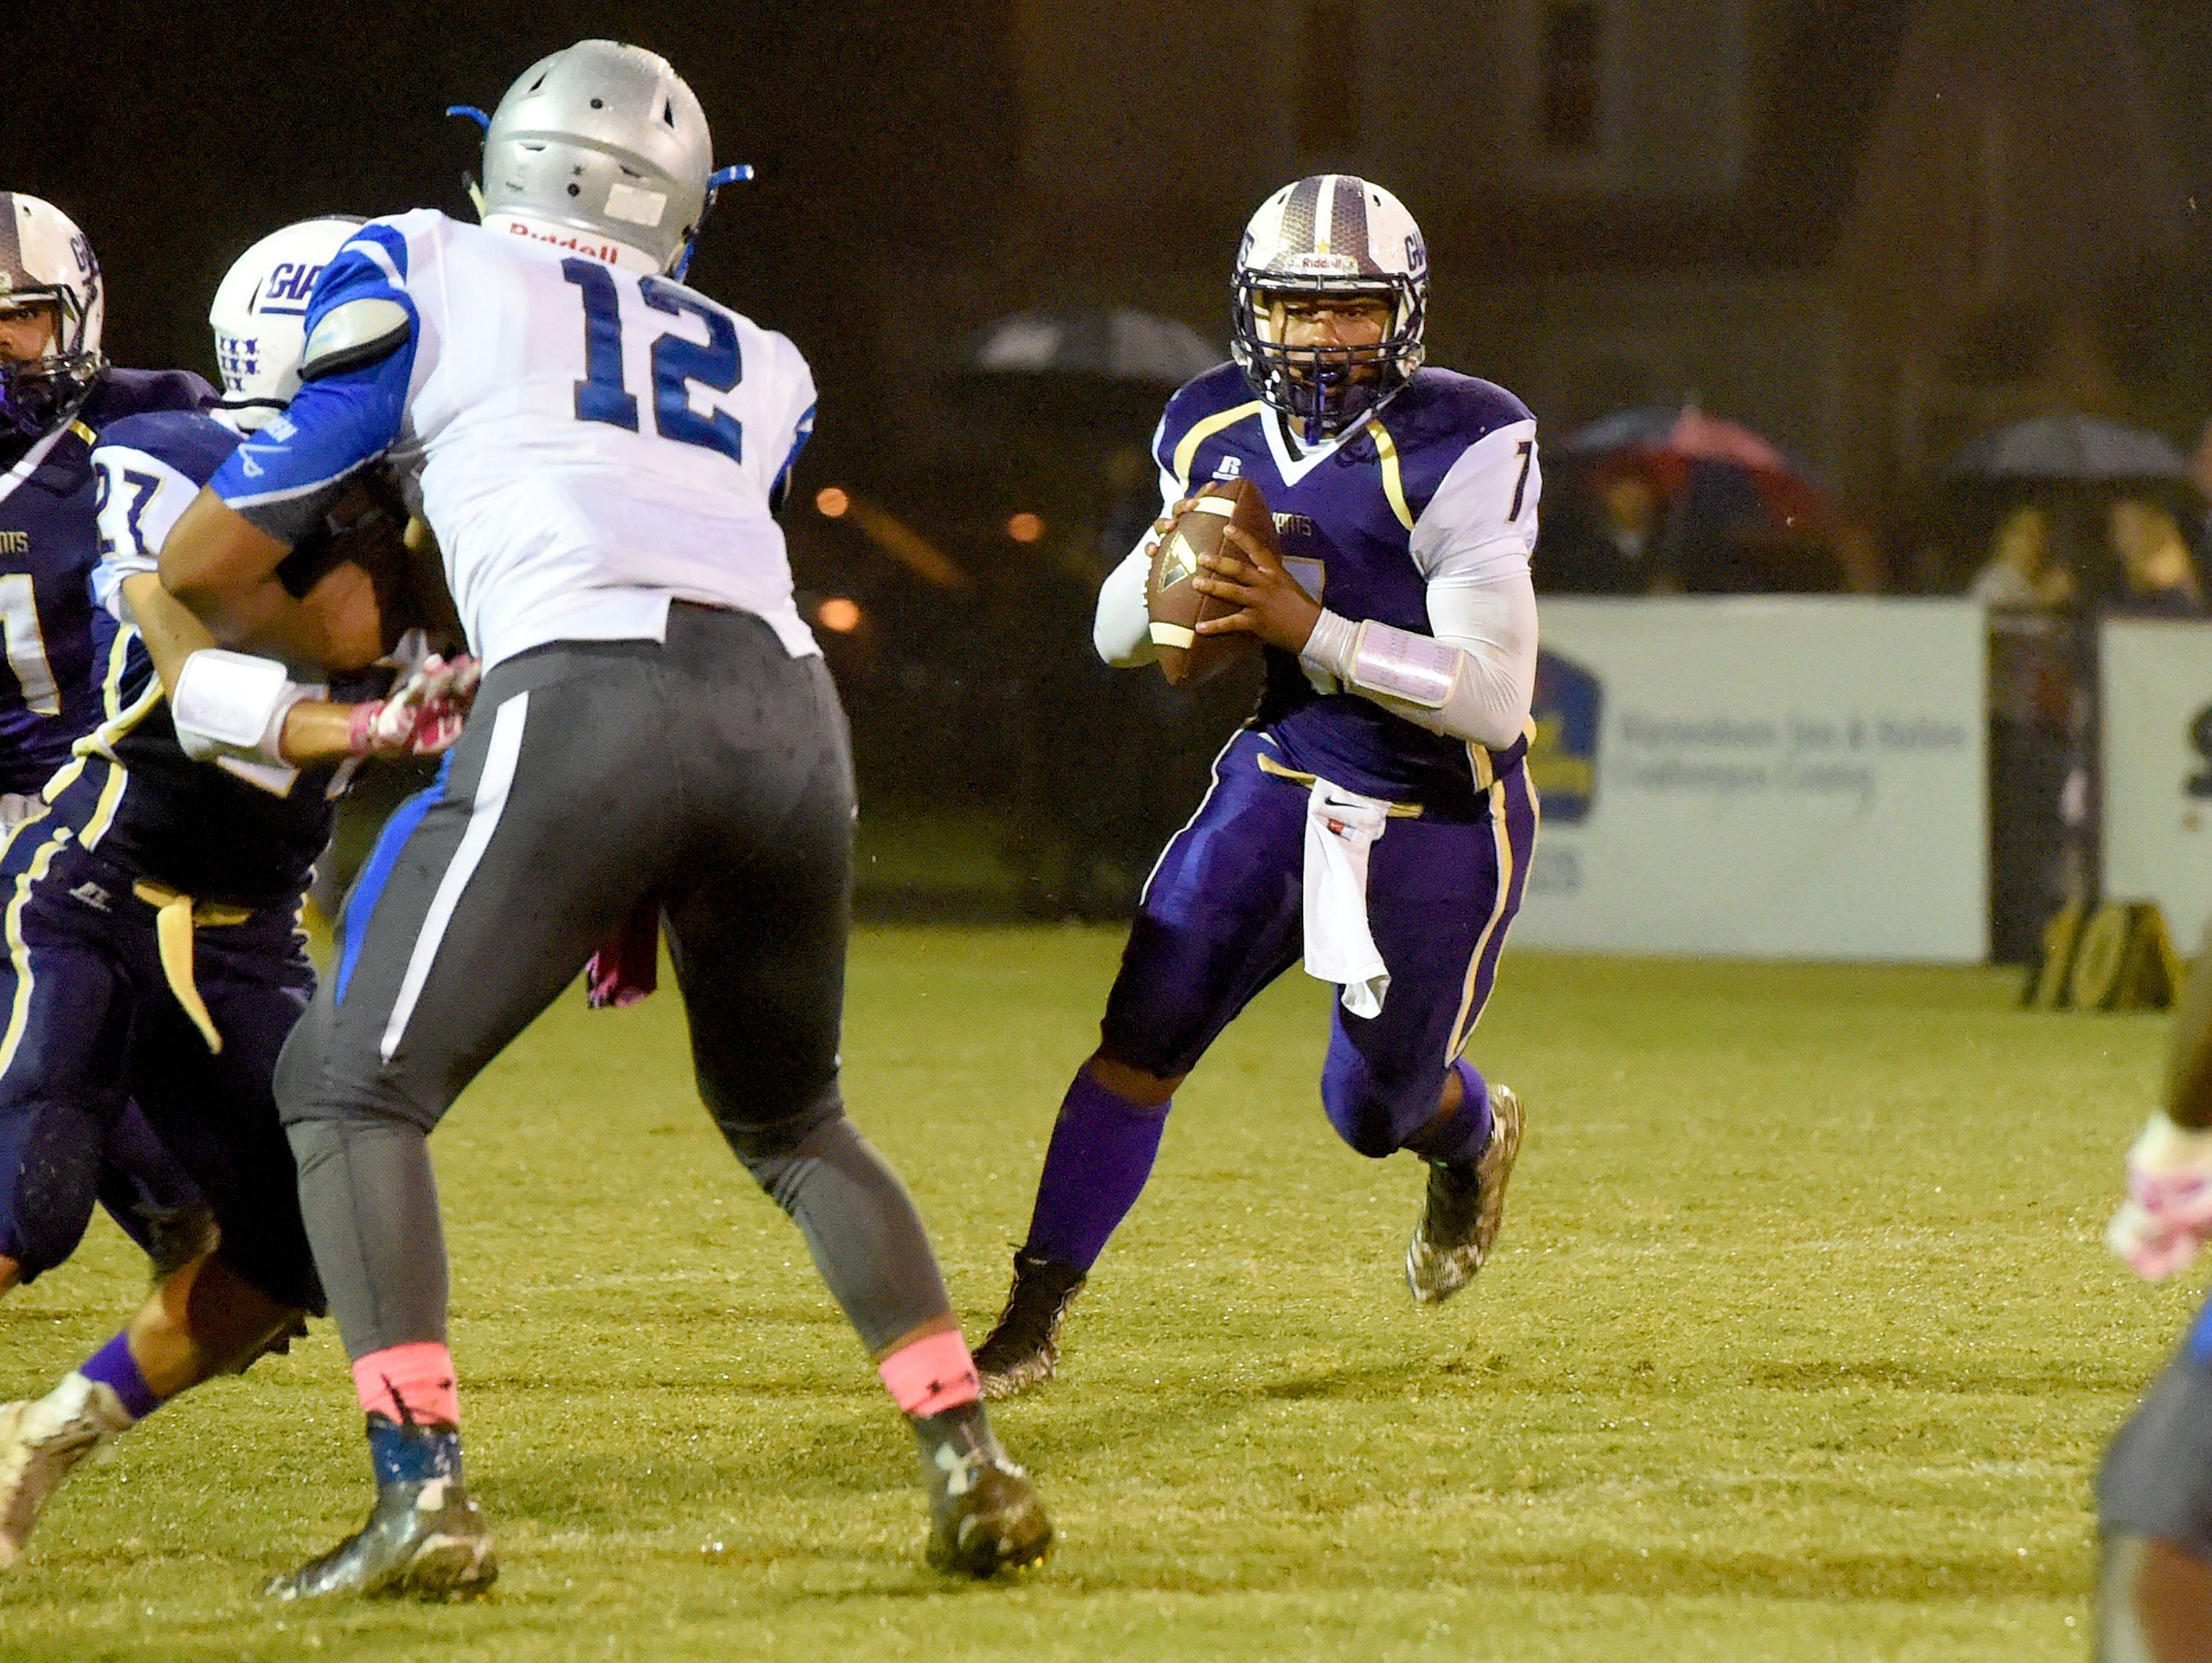 Waynesboro quarterback DaJuan Moore runs the football on a quarterback keep during a football game played in Waynesboro on Friday, Oct. 7, 2016.